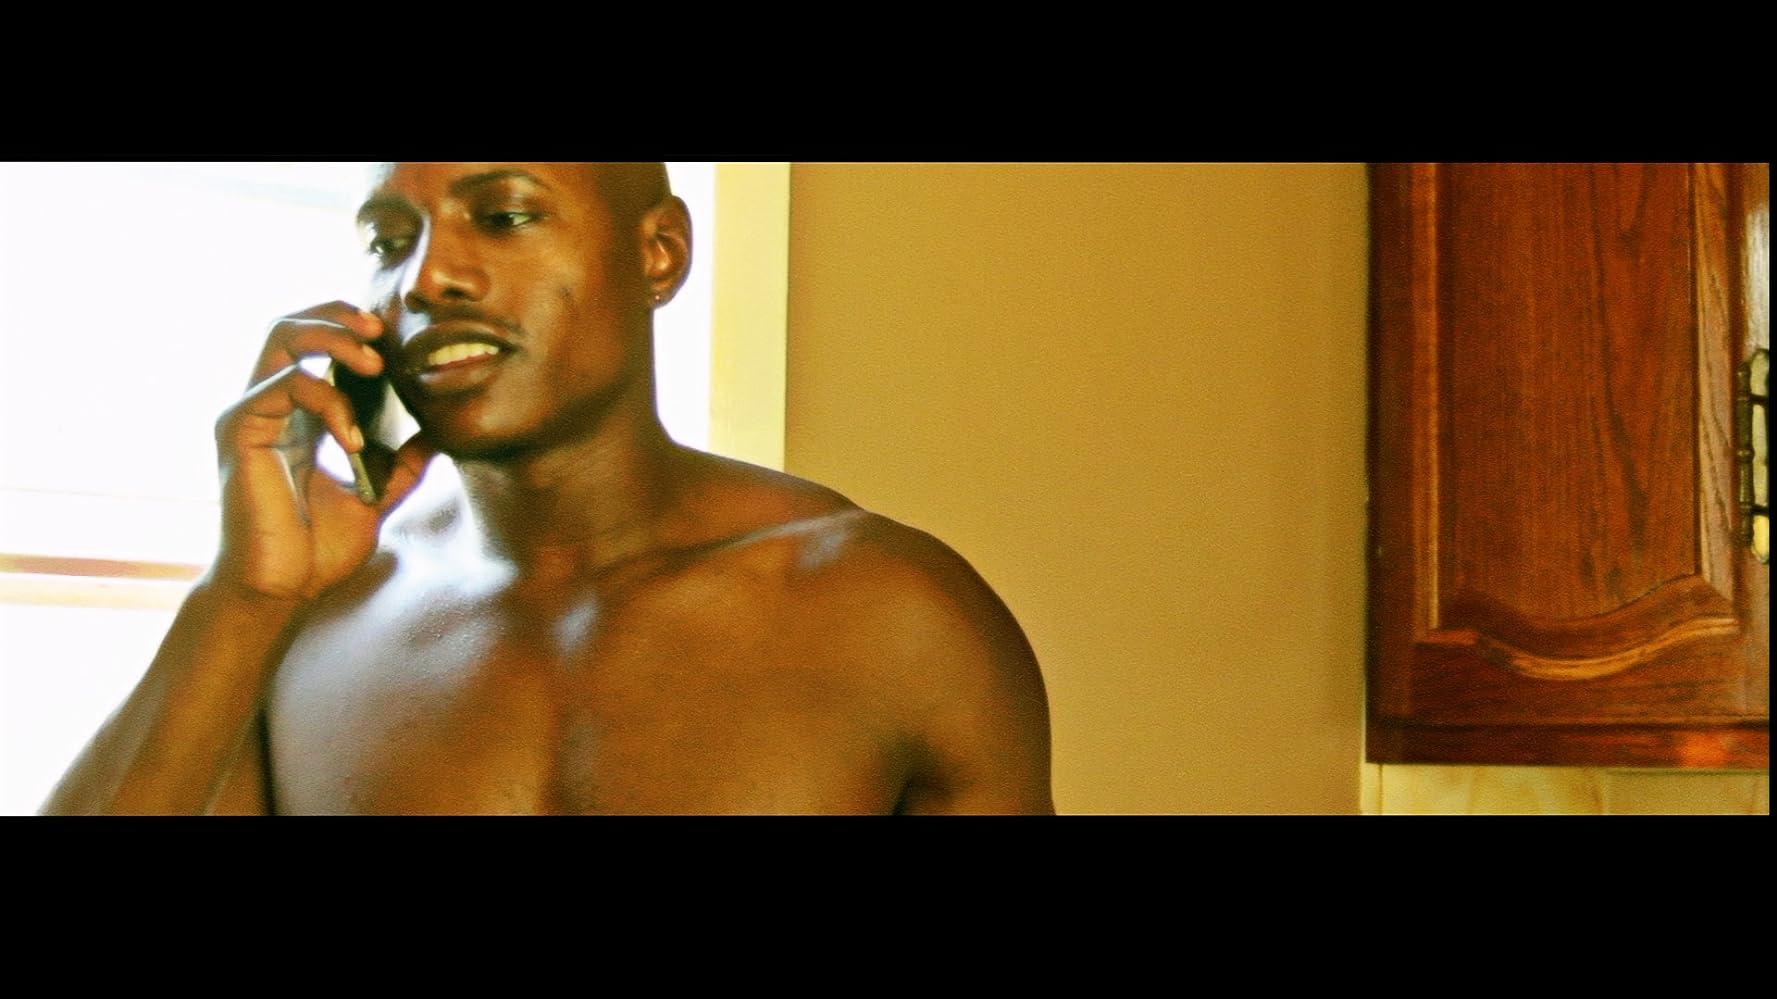 Shawn Singleton naked (24 photo), Pussy, Sideboobs, Instagram, cameltoe 2006